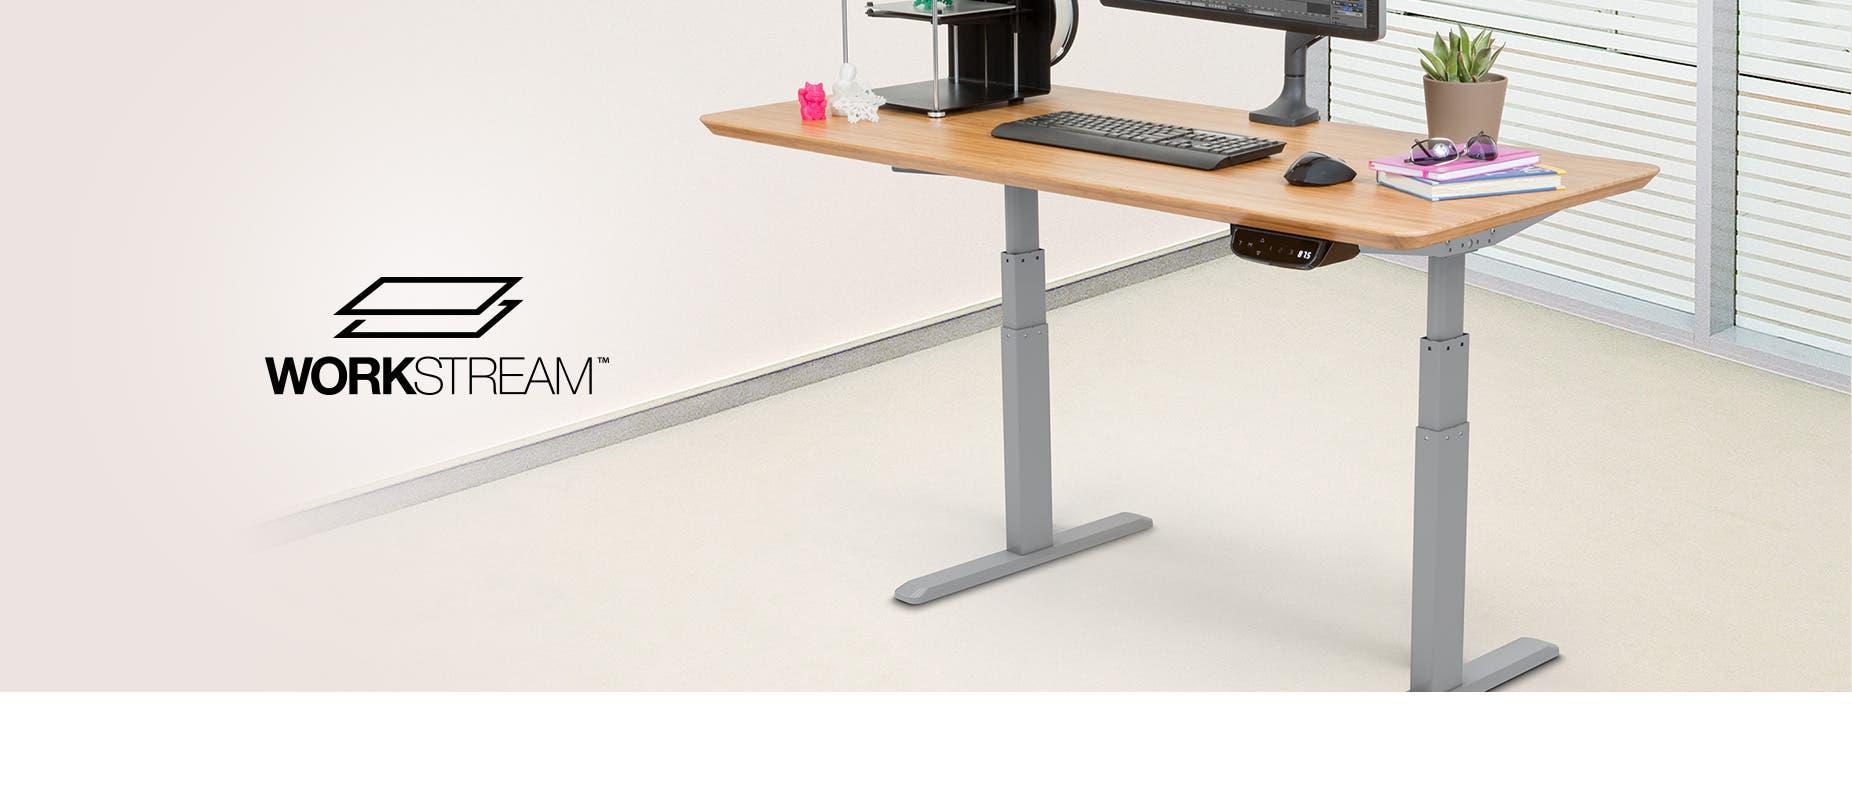 sit keyboard series bush elegant business desk furniture electric height metal stand adjustable awesome standing of amazing diy move corner legs black